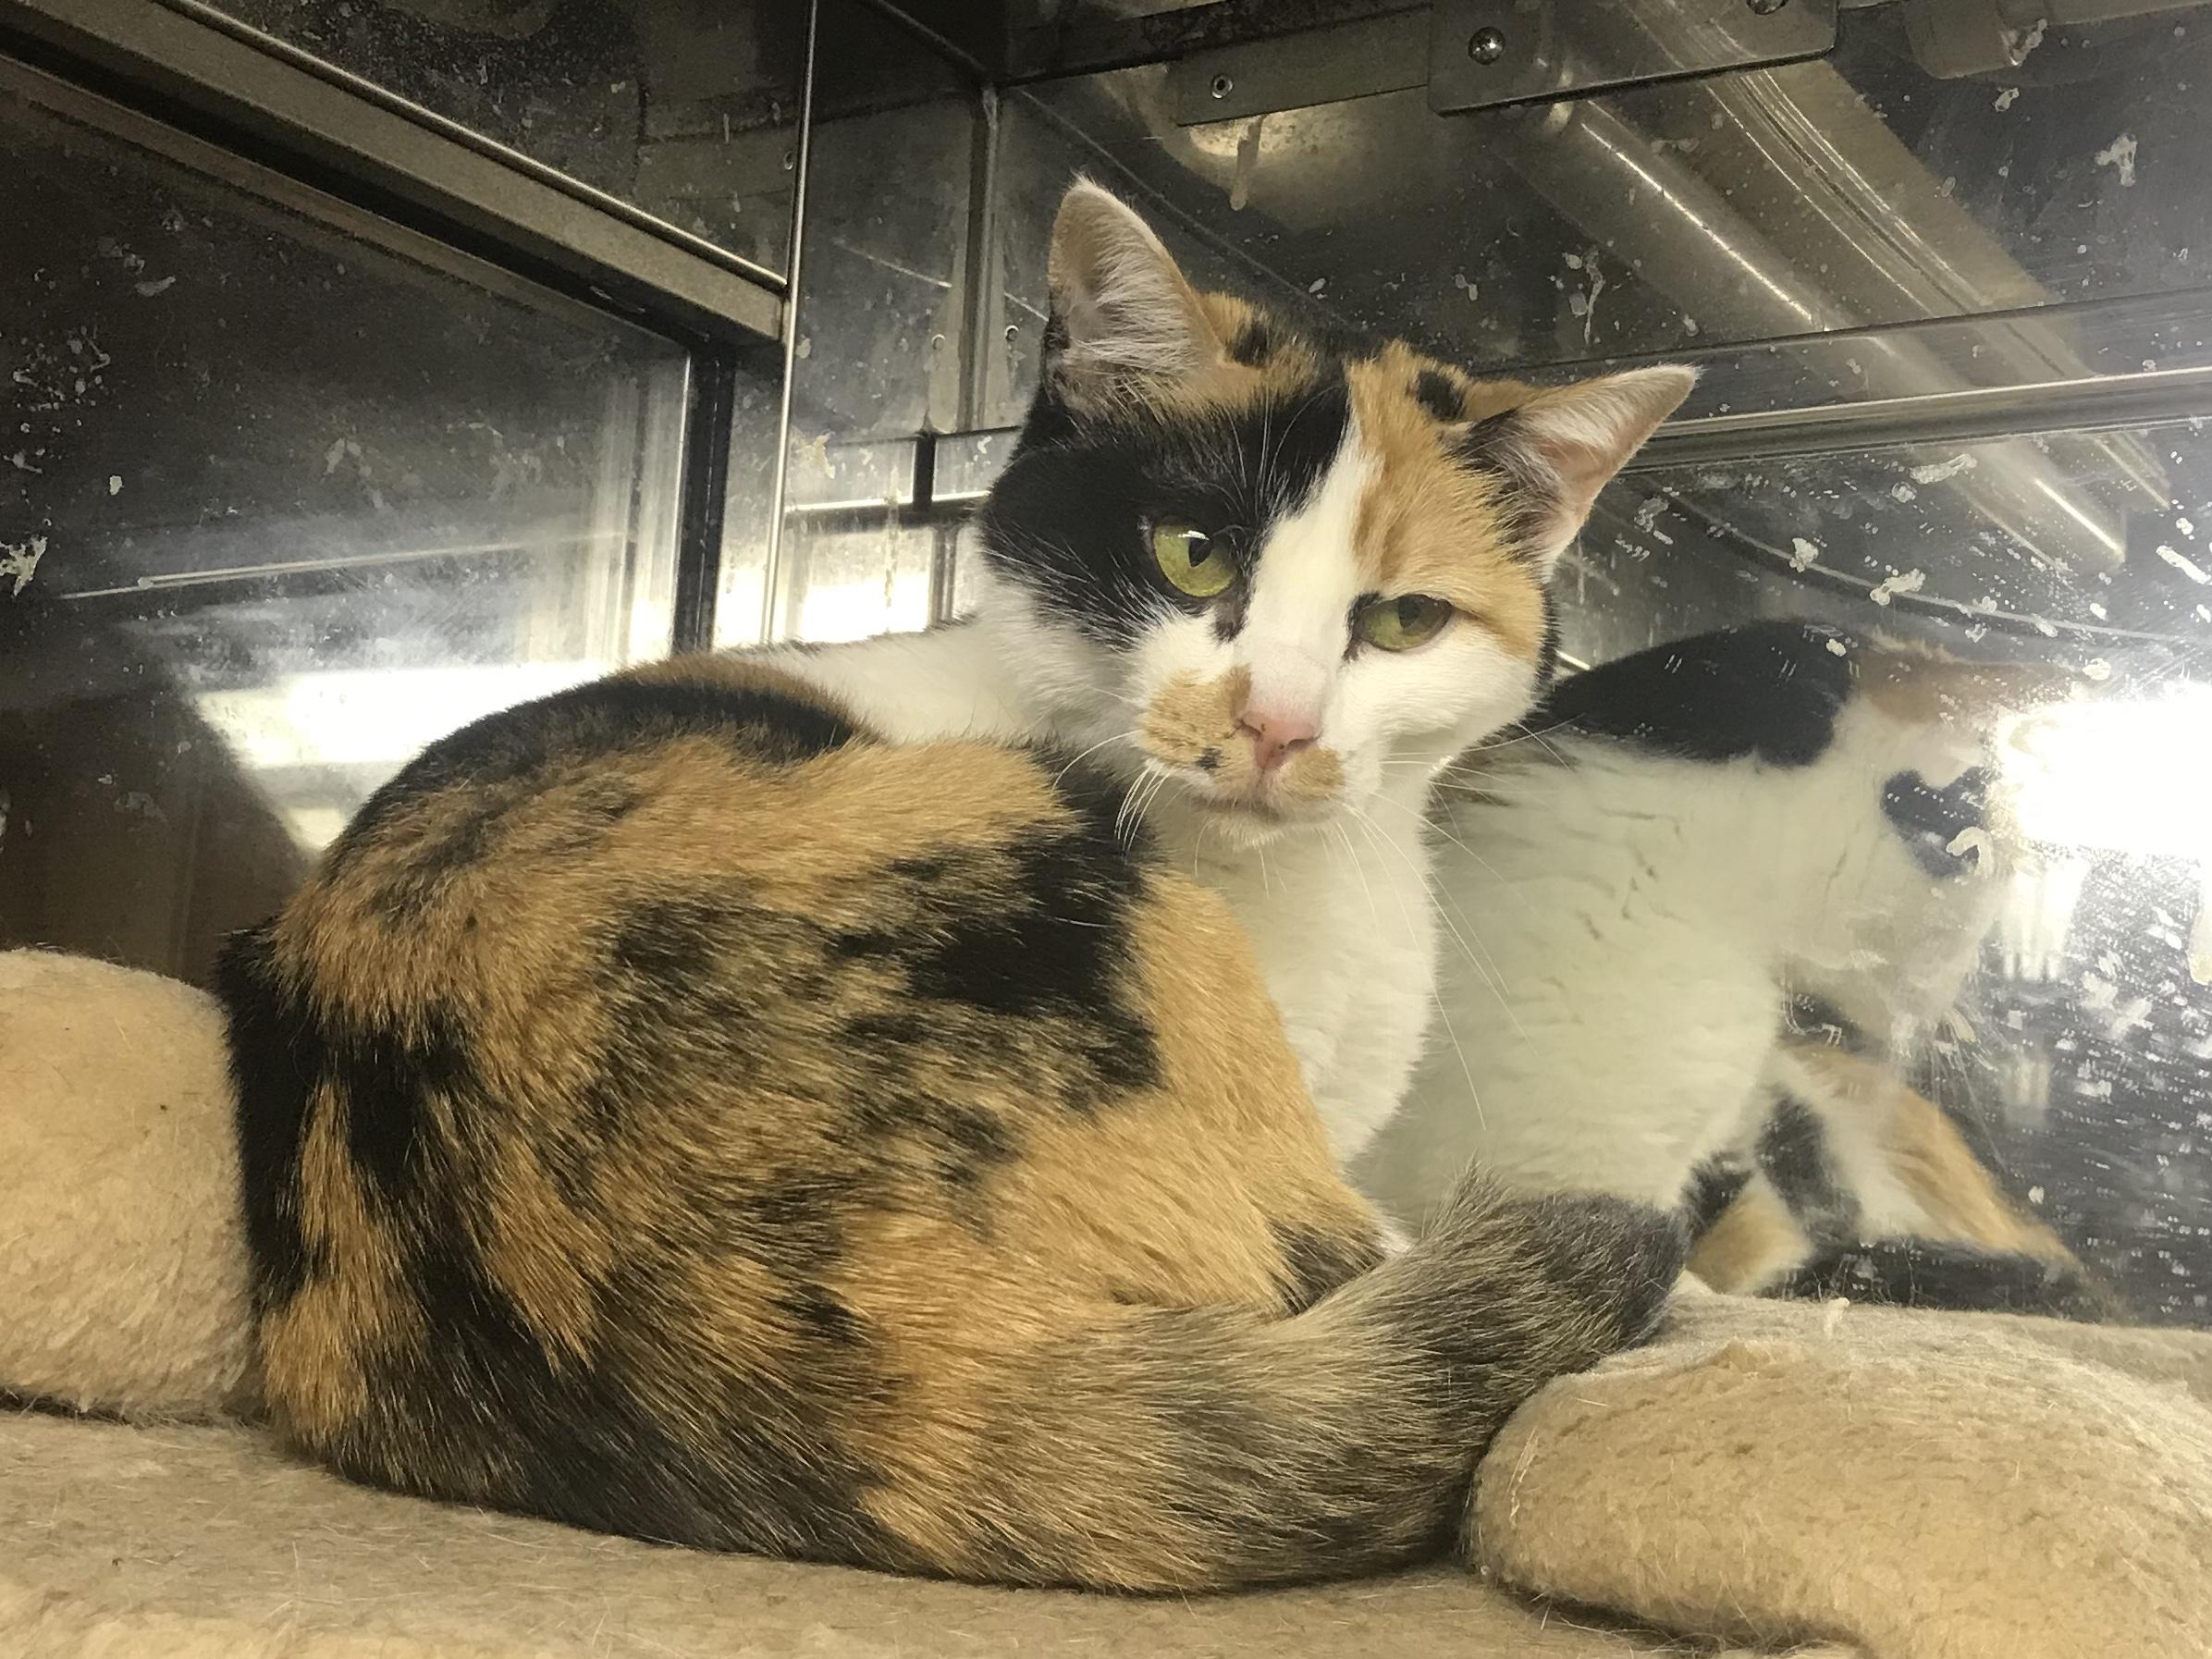 <p></p> <ul> <li>猫種:日本猫 三毛</li> <li>性別:女の子</li> <li>名前:テン</li> <li>年齢:2015年7月</li> <li>保護経緯:飼い主様が病気療養のため飼育困難になりました</li> </ul>